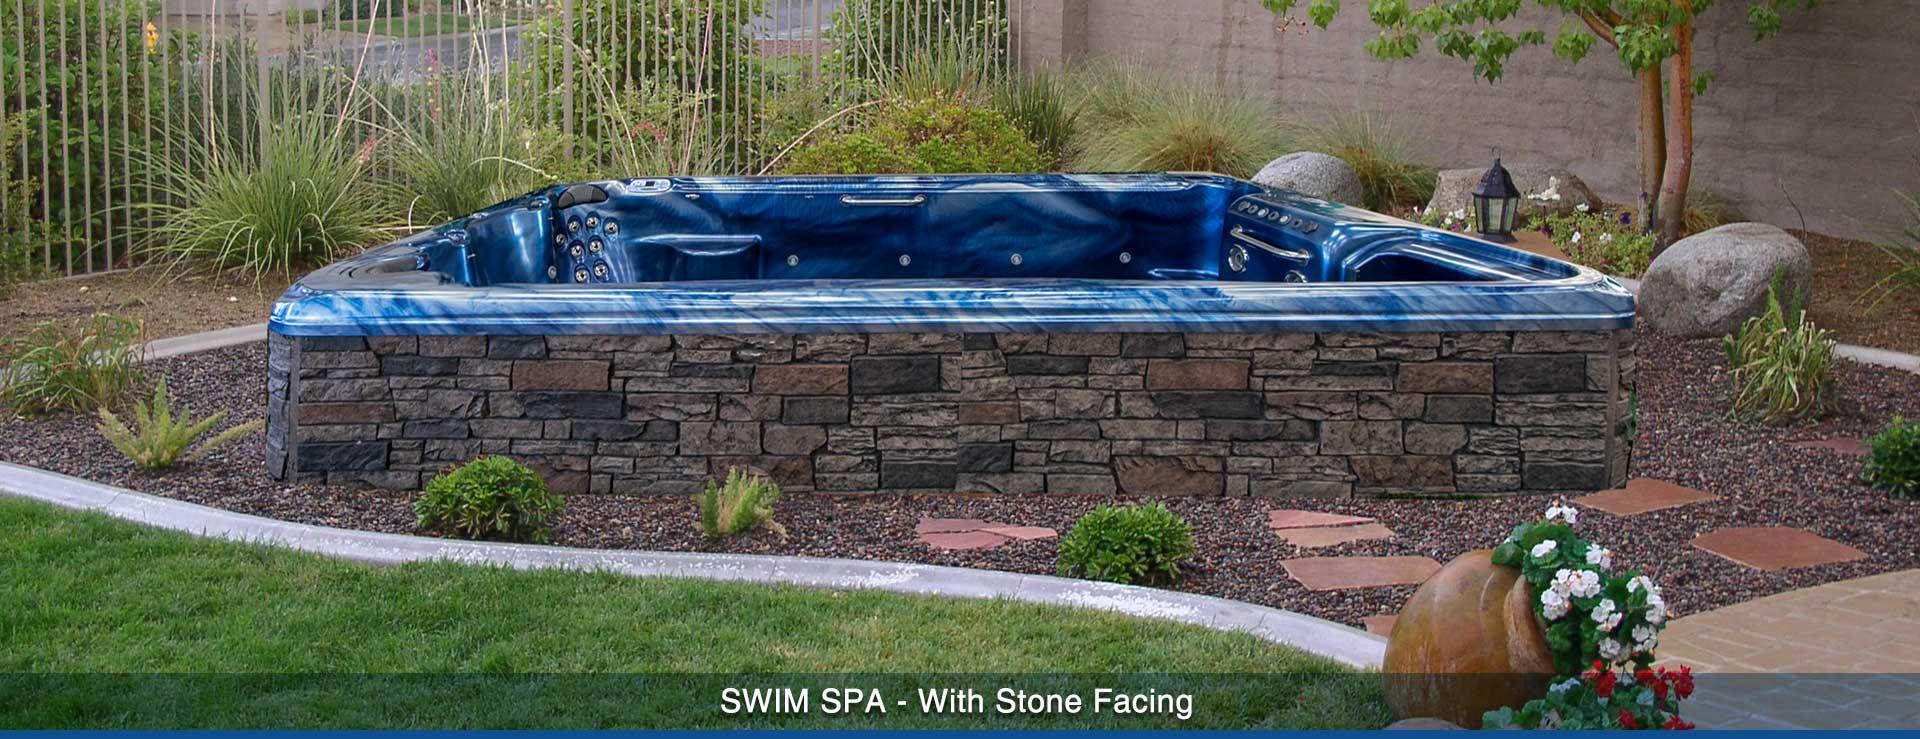 Image Result For Above Ground Swim Spa Designs Swim Spa